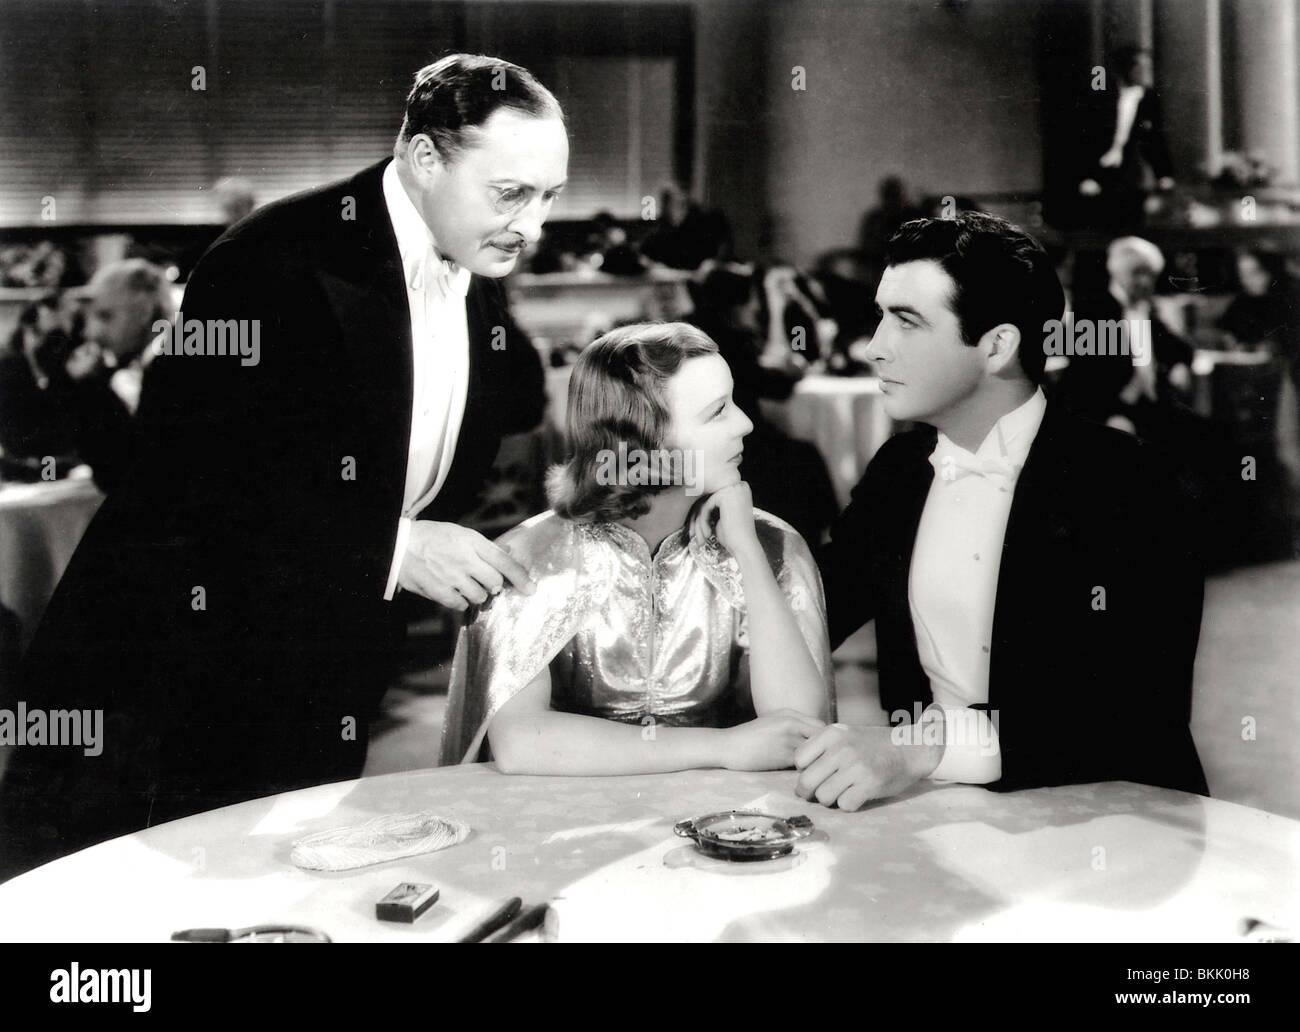 Trois camarades (1938) Lionel Atwill, MARGARET SULLAVAN, ROBERT TAYLOR TREC 009 P Photo Stock